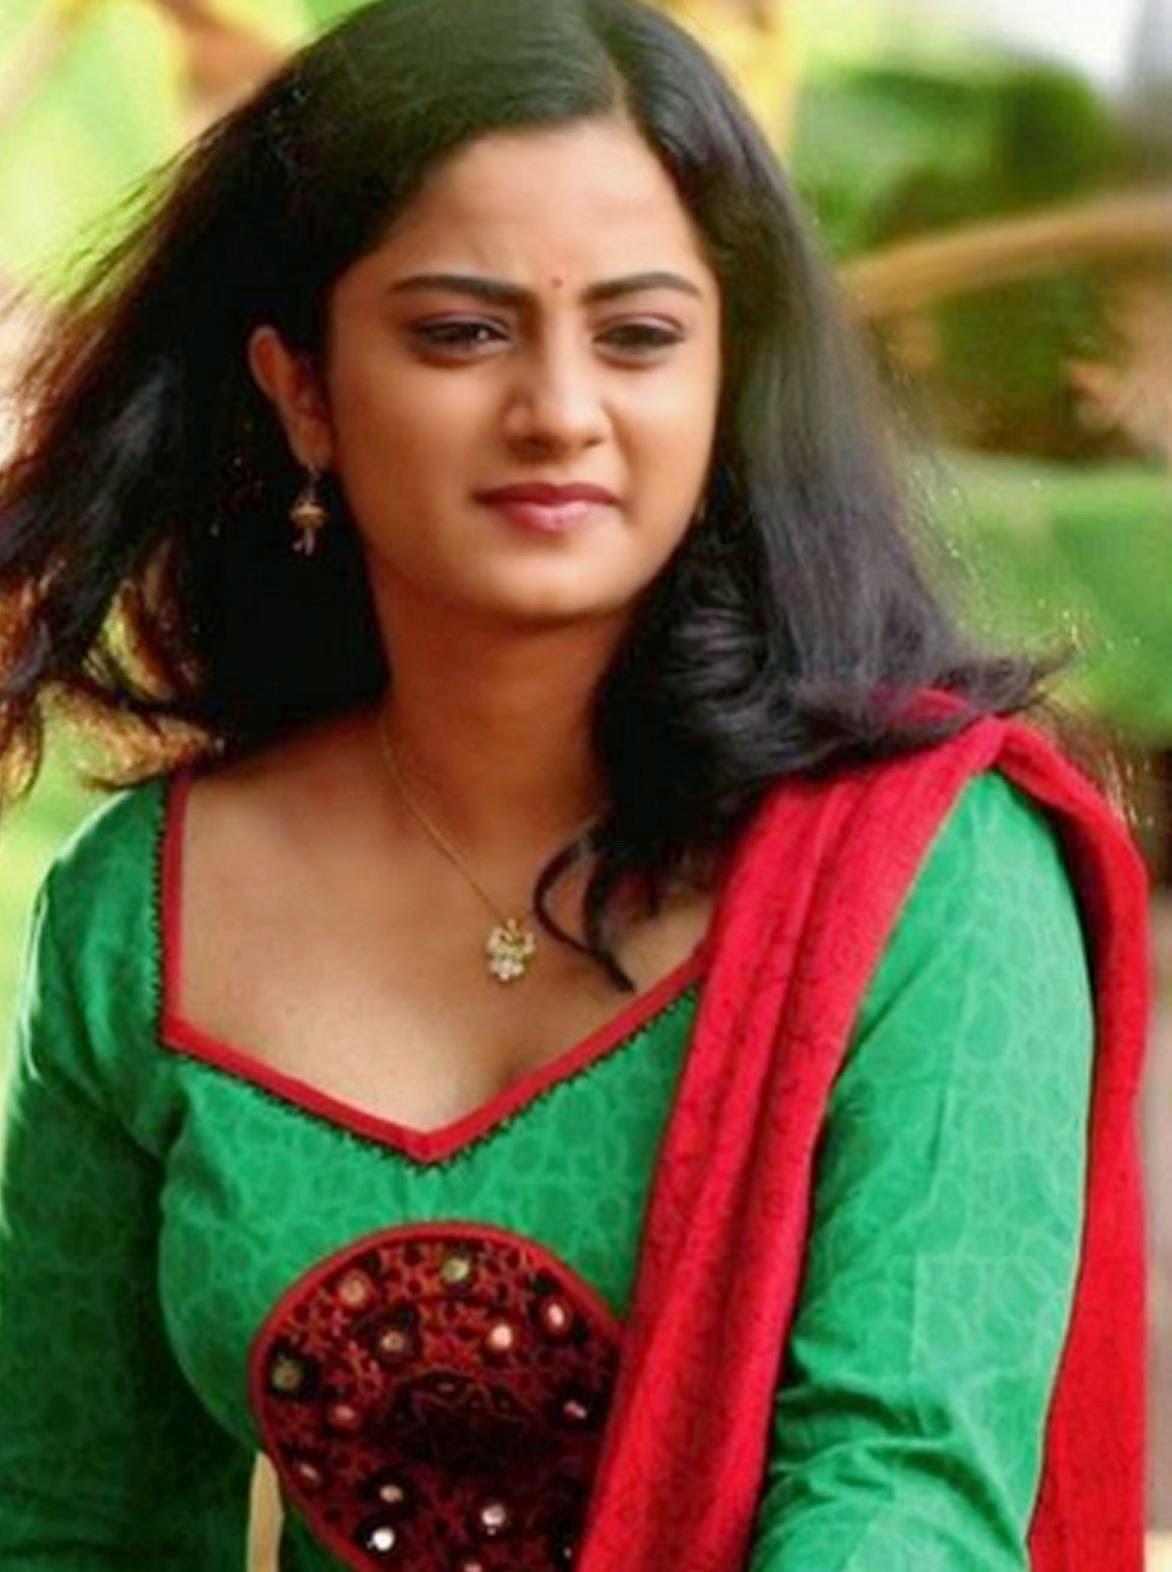 Malayalam actress ranjini hot unseen boobs squeezed - 3 10